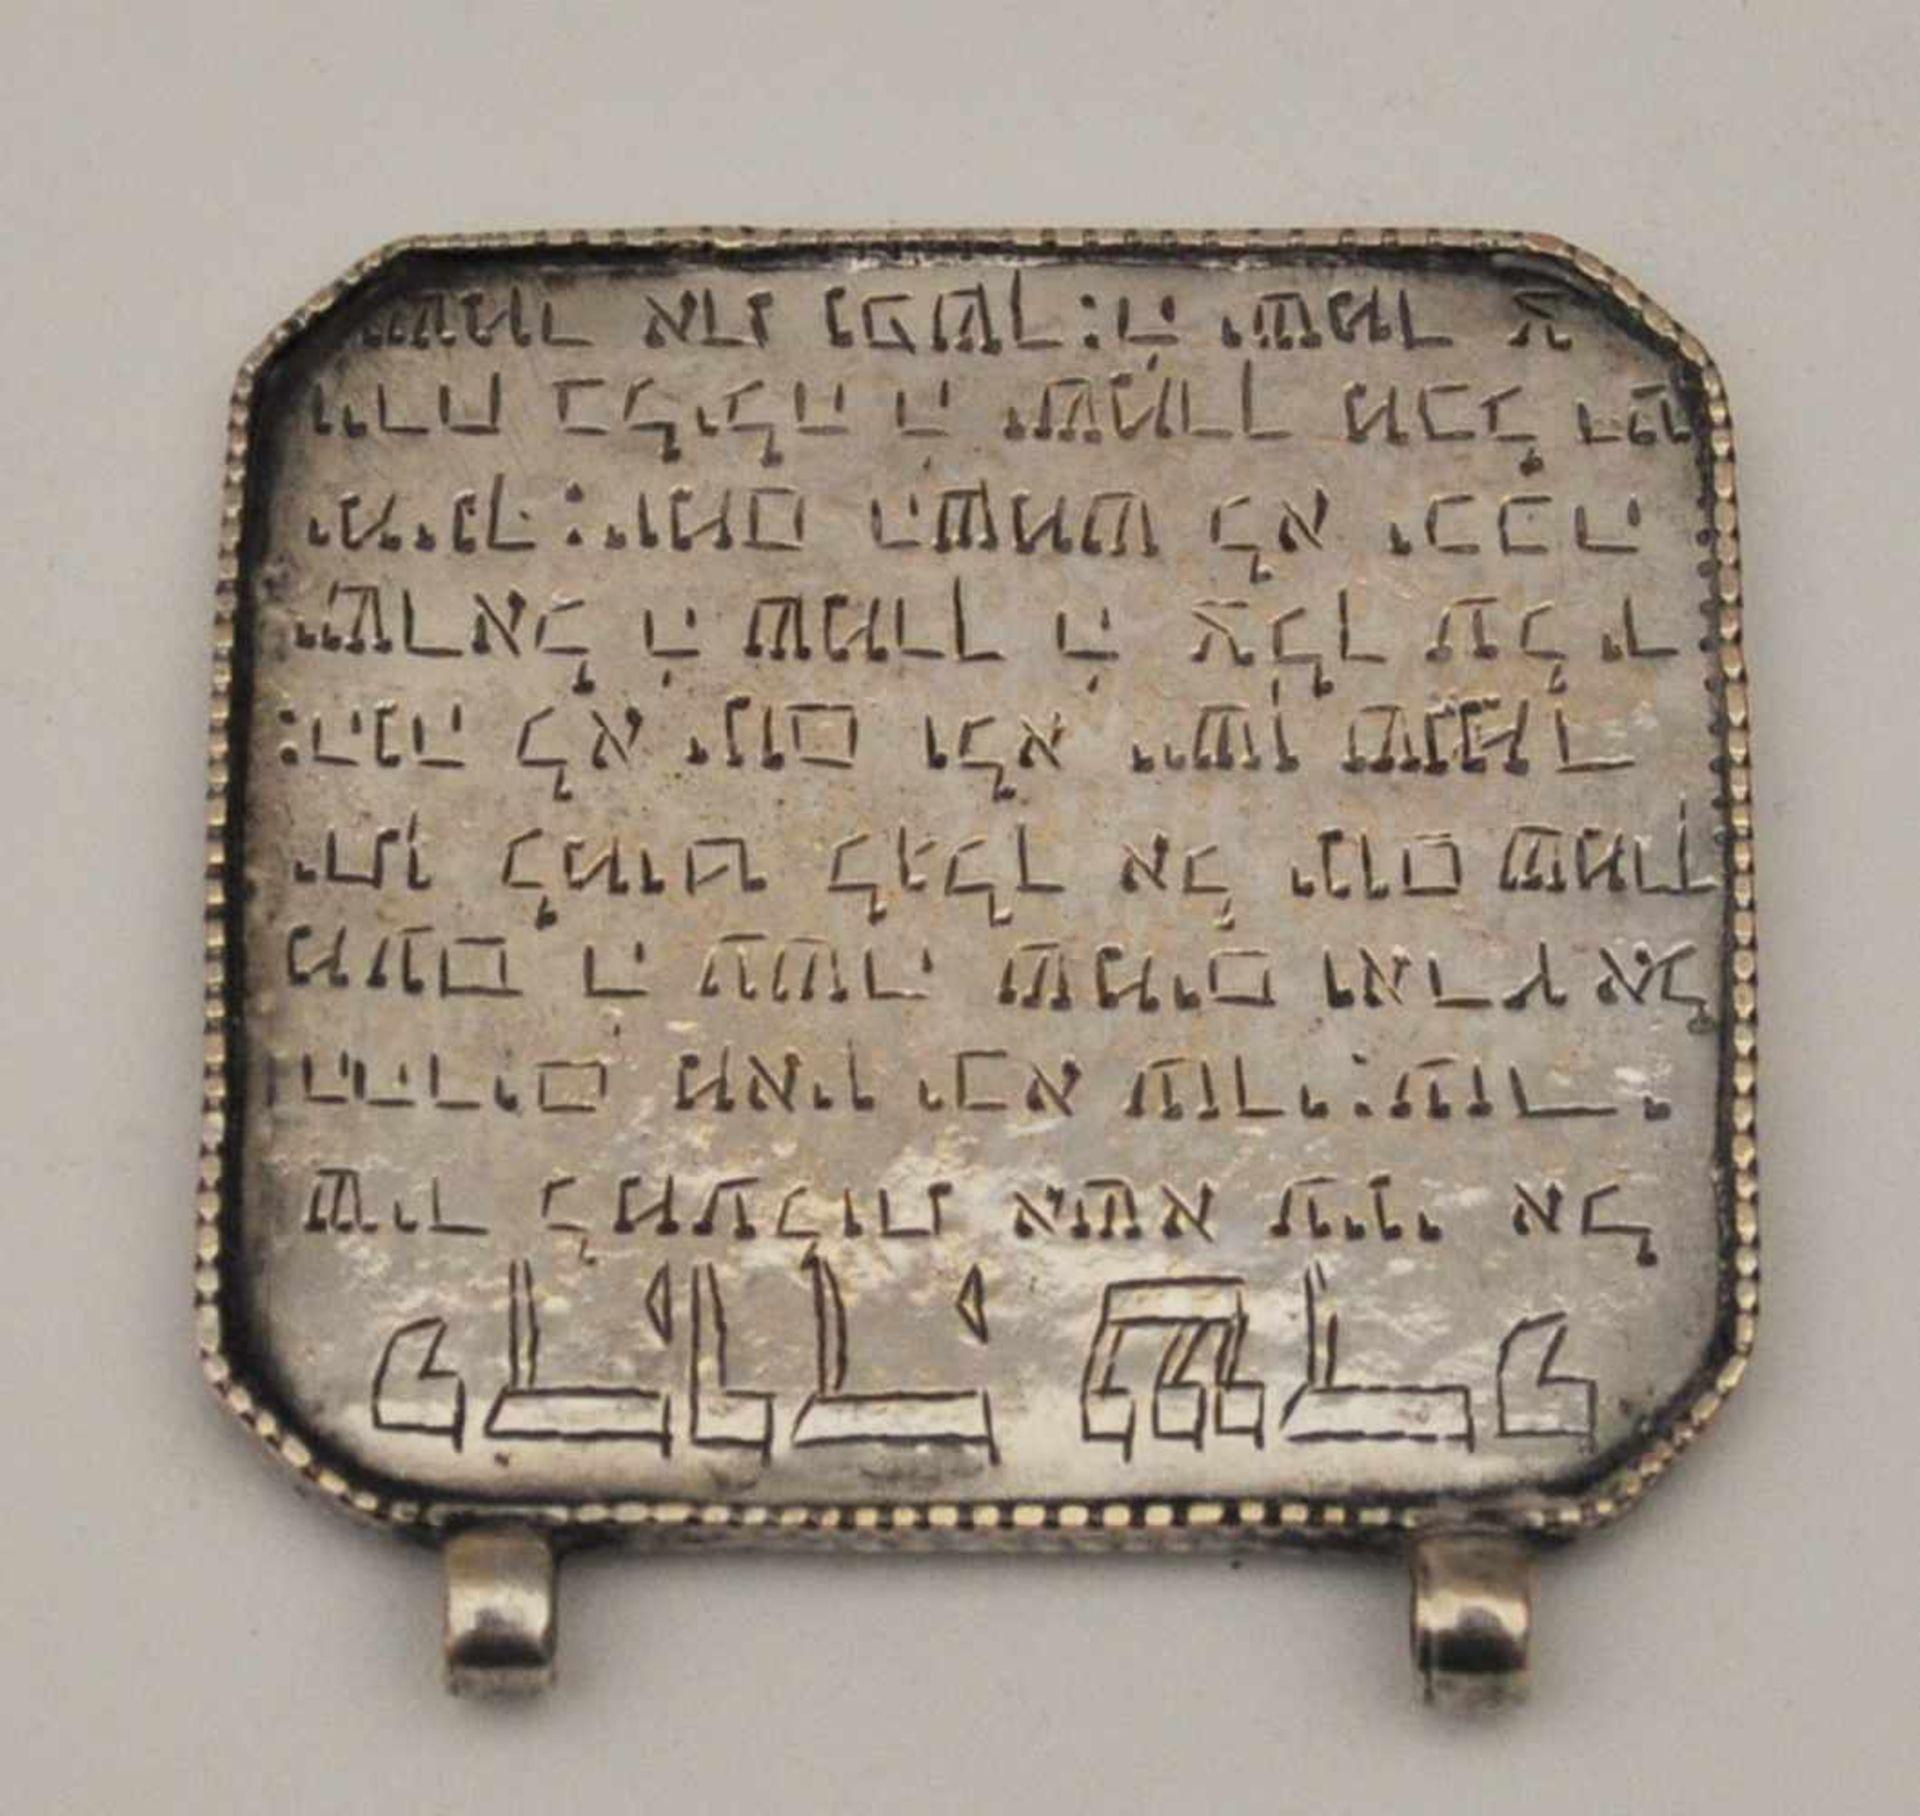 Los 36 - Gebetstafel, 18./19. Jh.Beschriftet mit 'Shir lemaalot',Silber, Gewicht 46 g, 7,5 x 7,5 cm